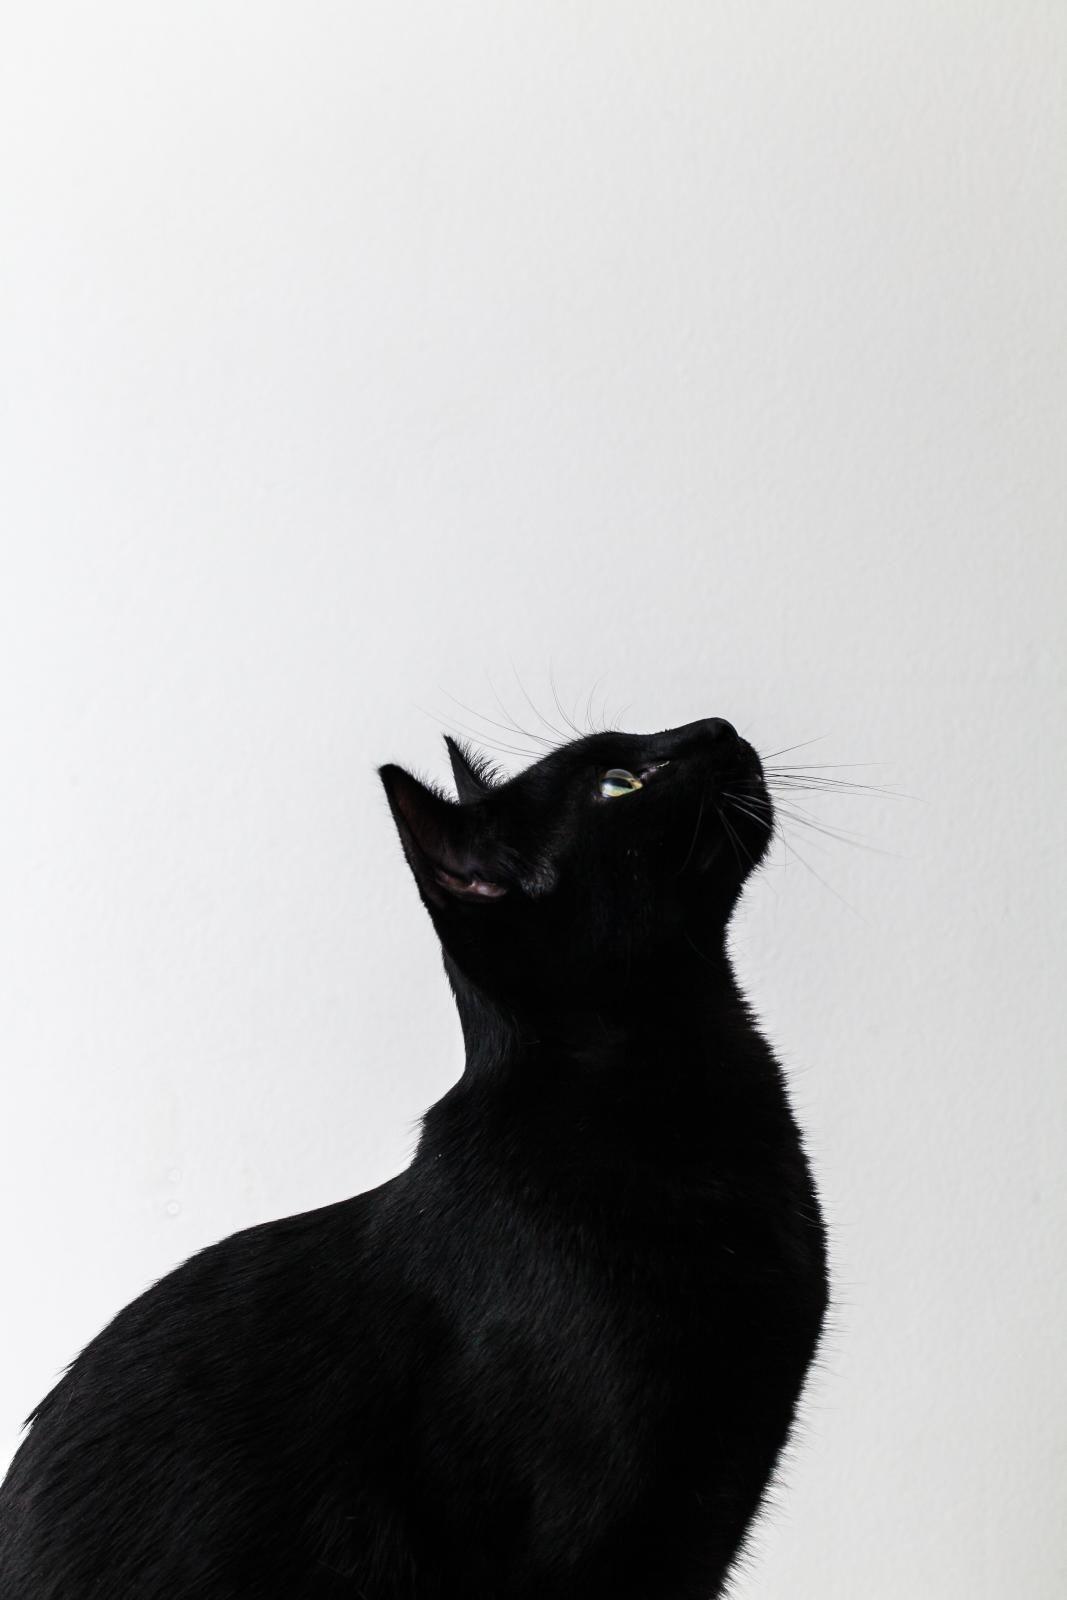 En smoking I | ♥ I Love Black Kitties ♥ | Cats, Cats ...